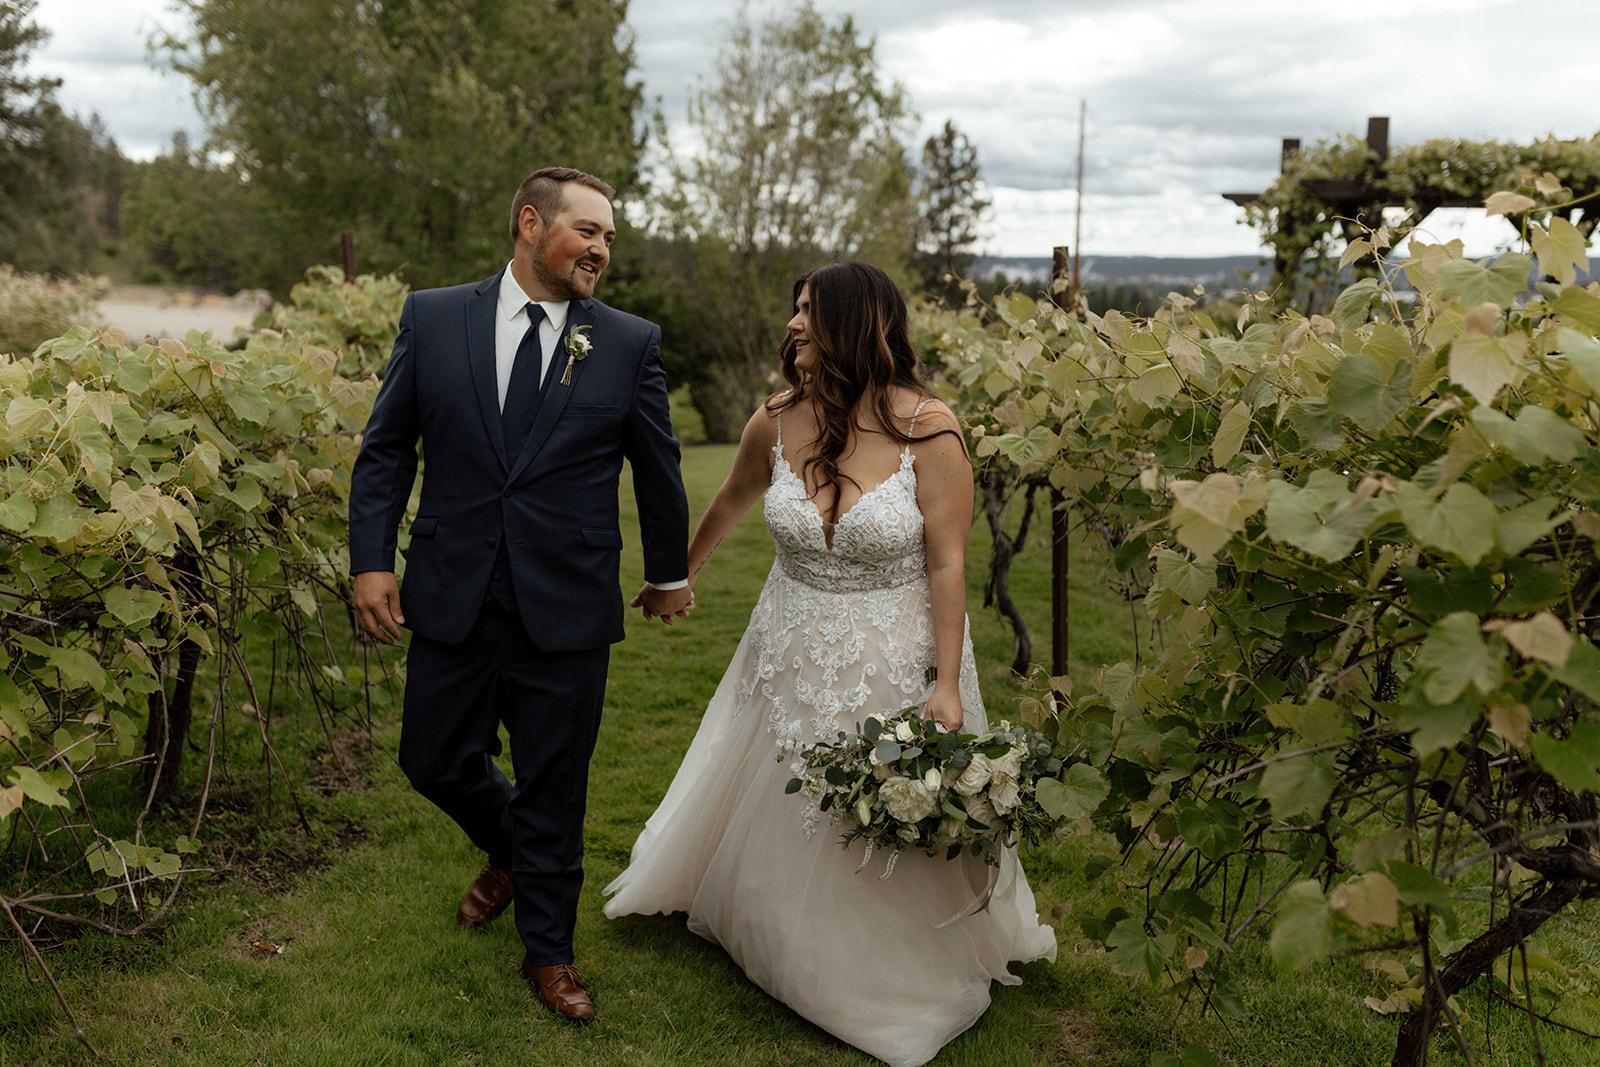 beacon hill wedding honest in ivory dress spokane vineyard